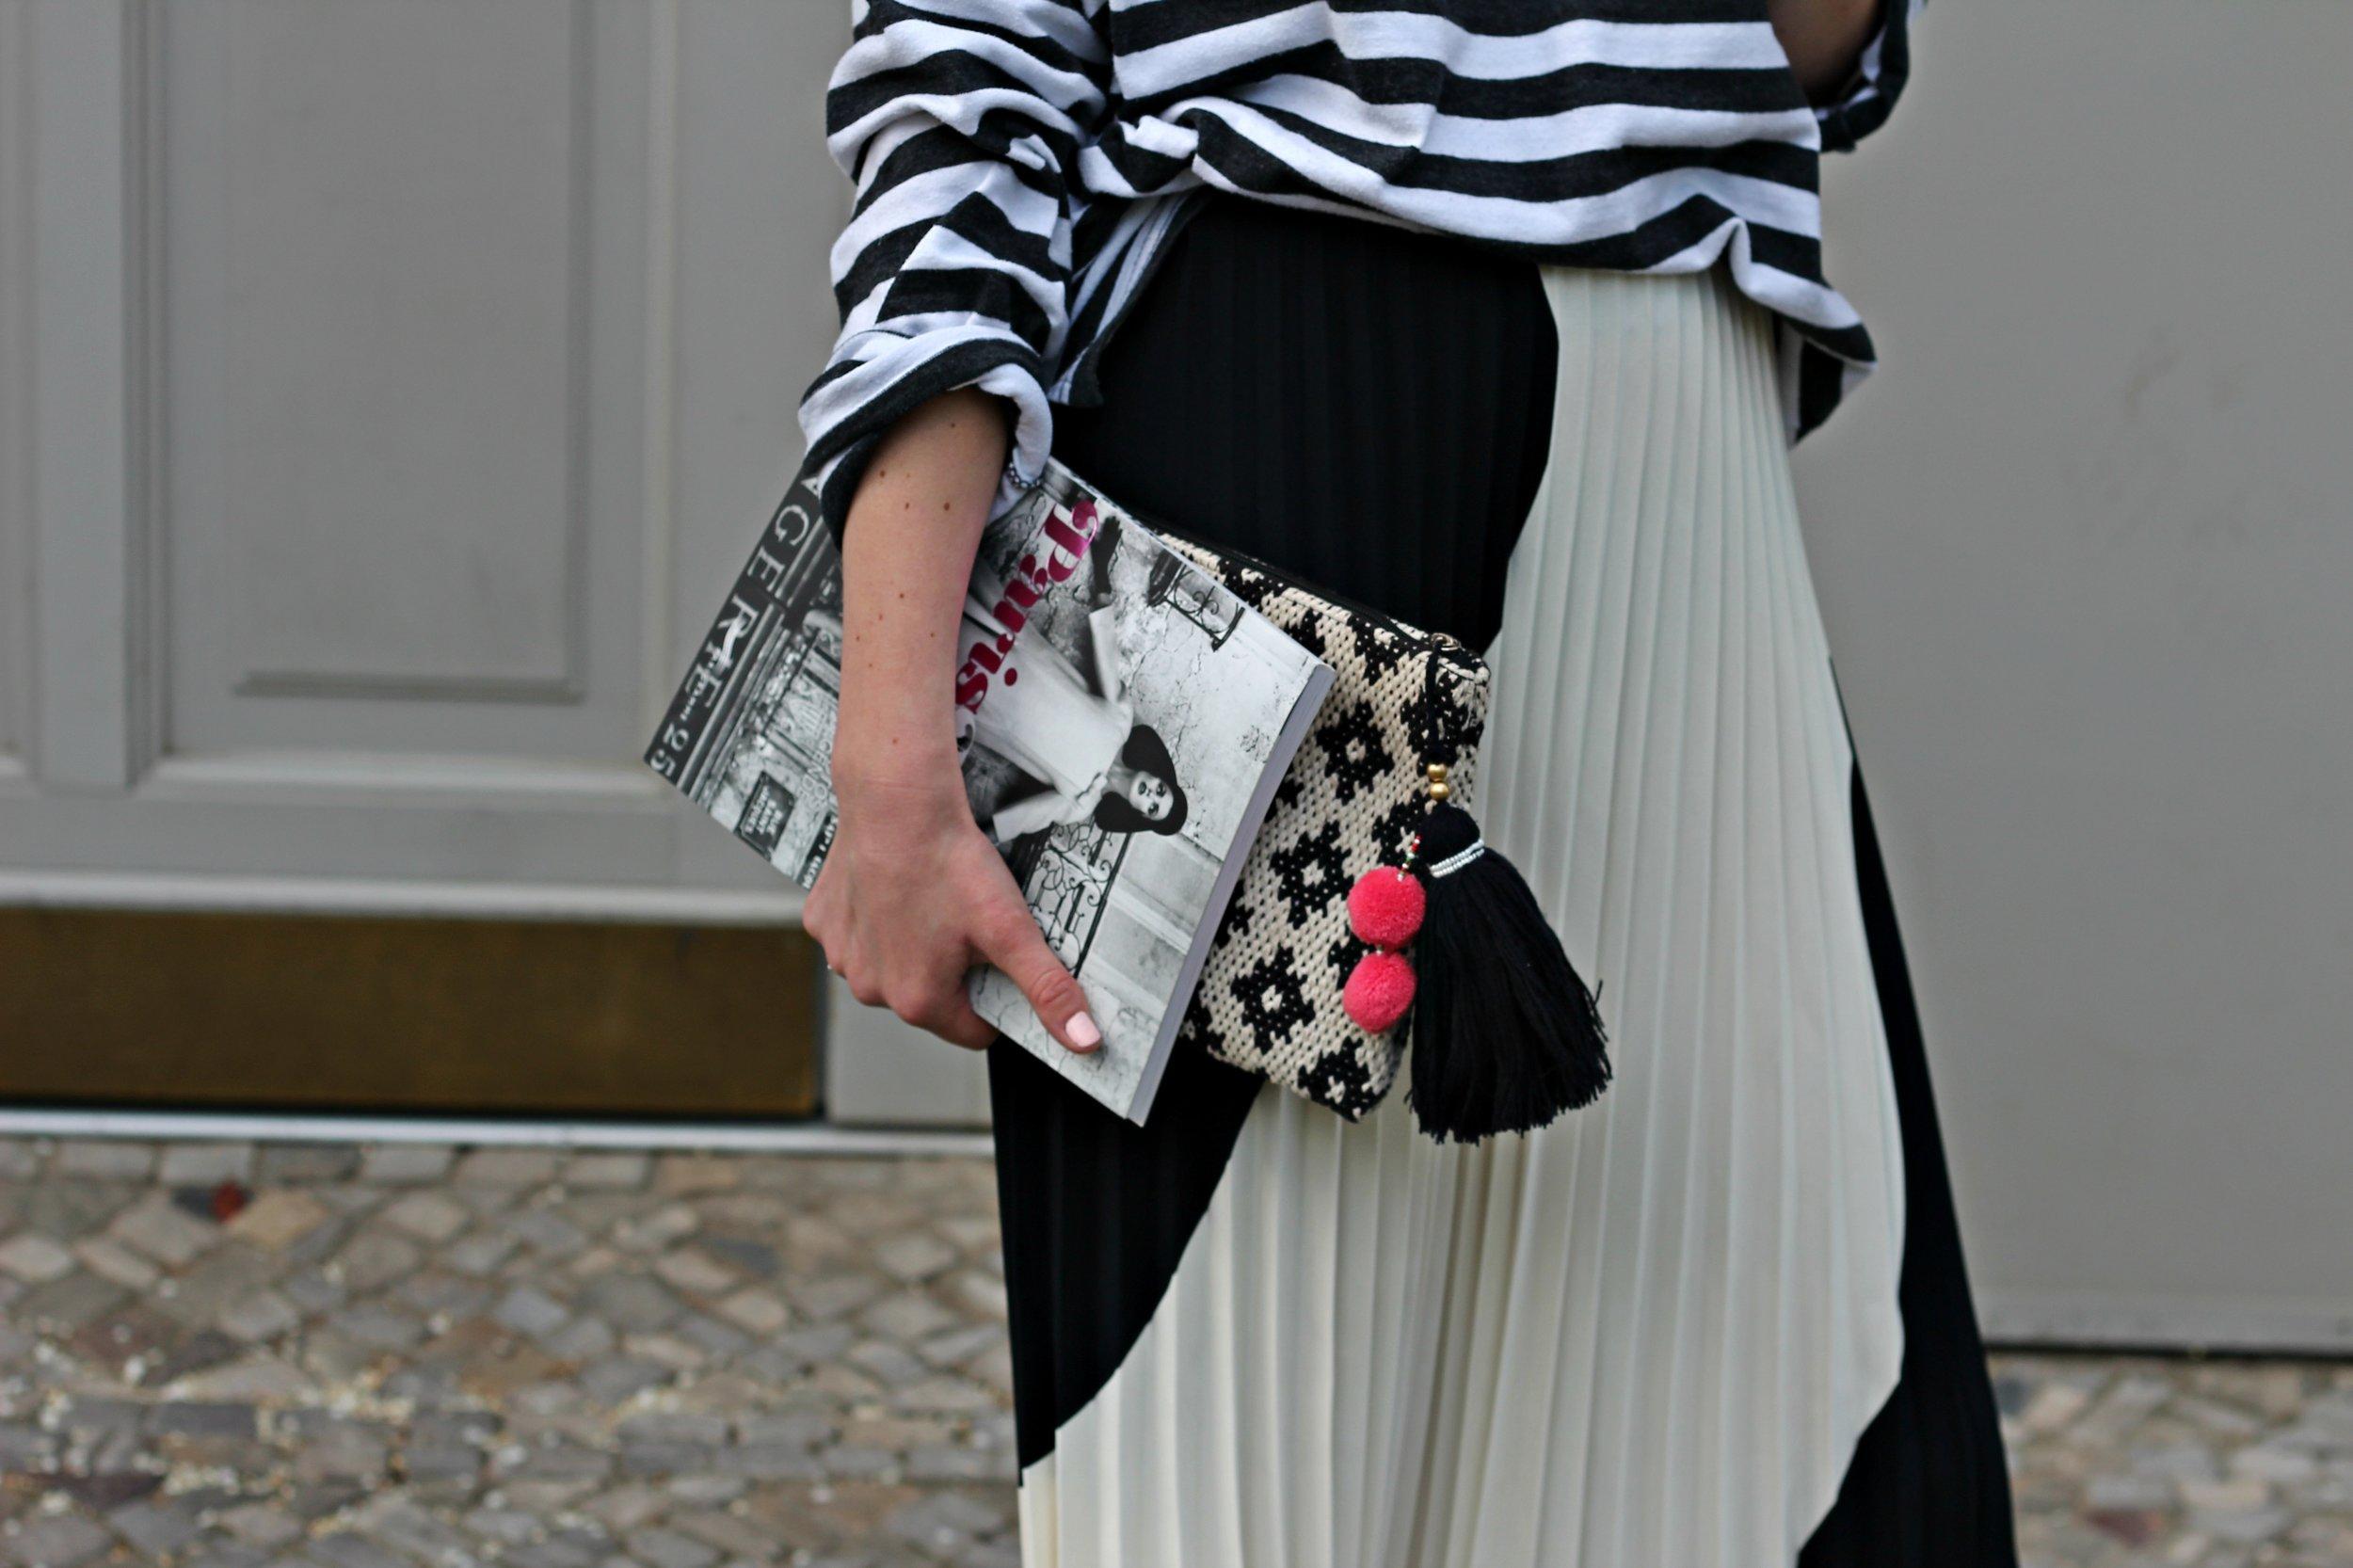 annaporter-blackandwhite-stripes-fashionblogger-details.jpg